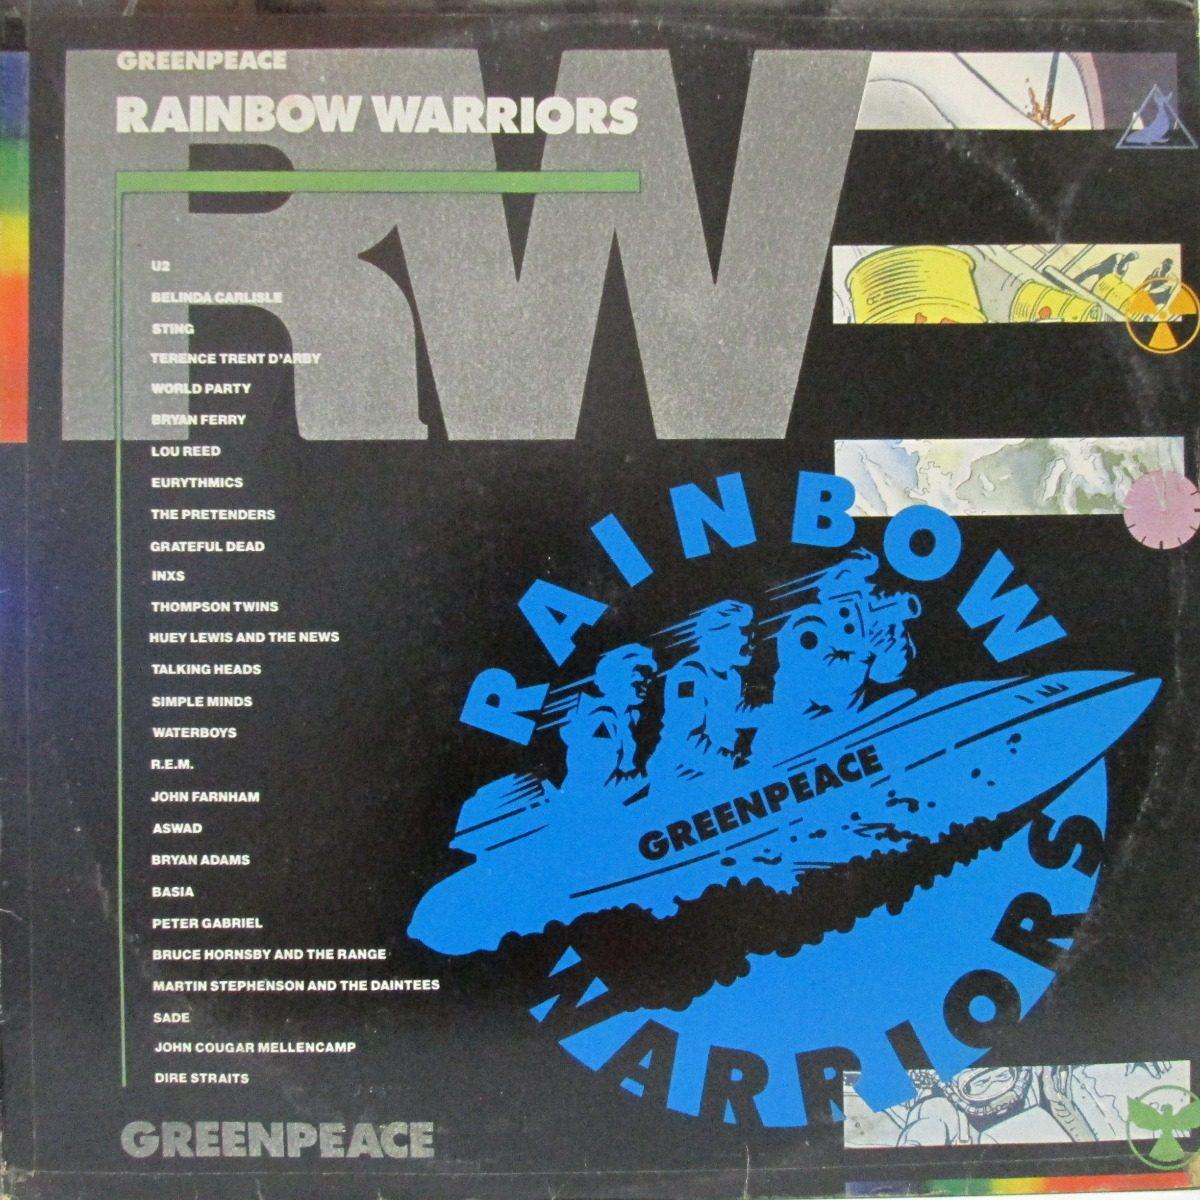 Warriors Of The Rainbow 2 Vietsub: Lp Greenpeace Rainbow Warriors U2 Inxs Lou Reed Gratefu